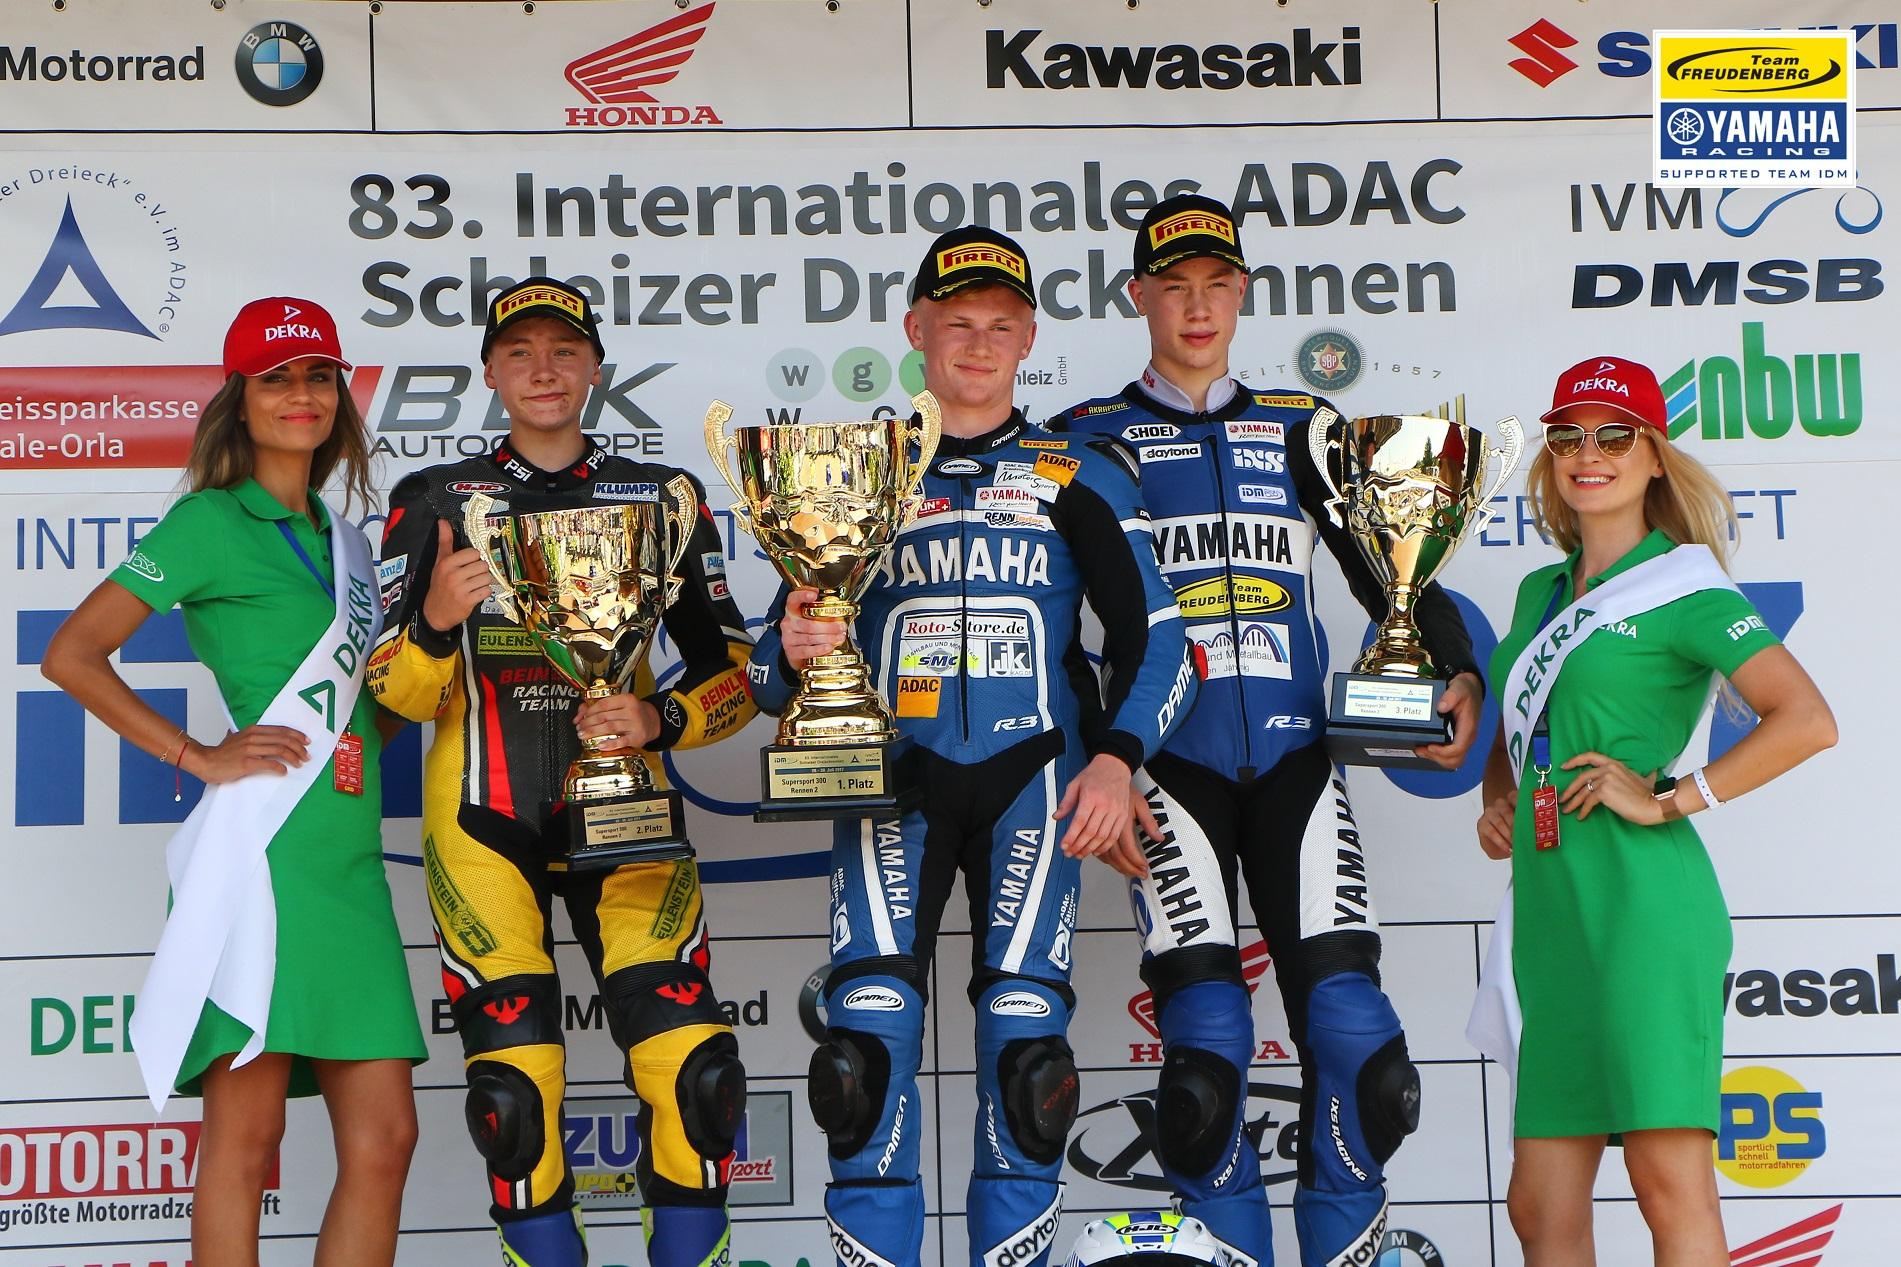 Georgi gewinnt am Schleizer Dreieck – Team Yamaha Freudenberg behauptet Spitzenposition in der IDM